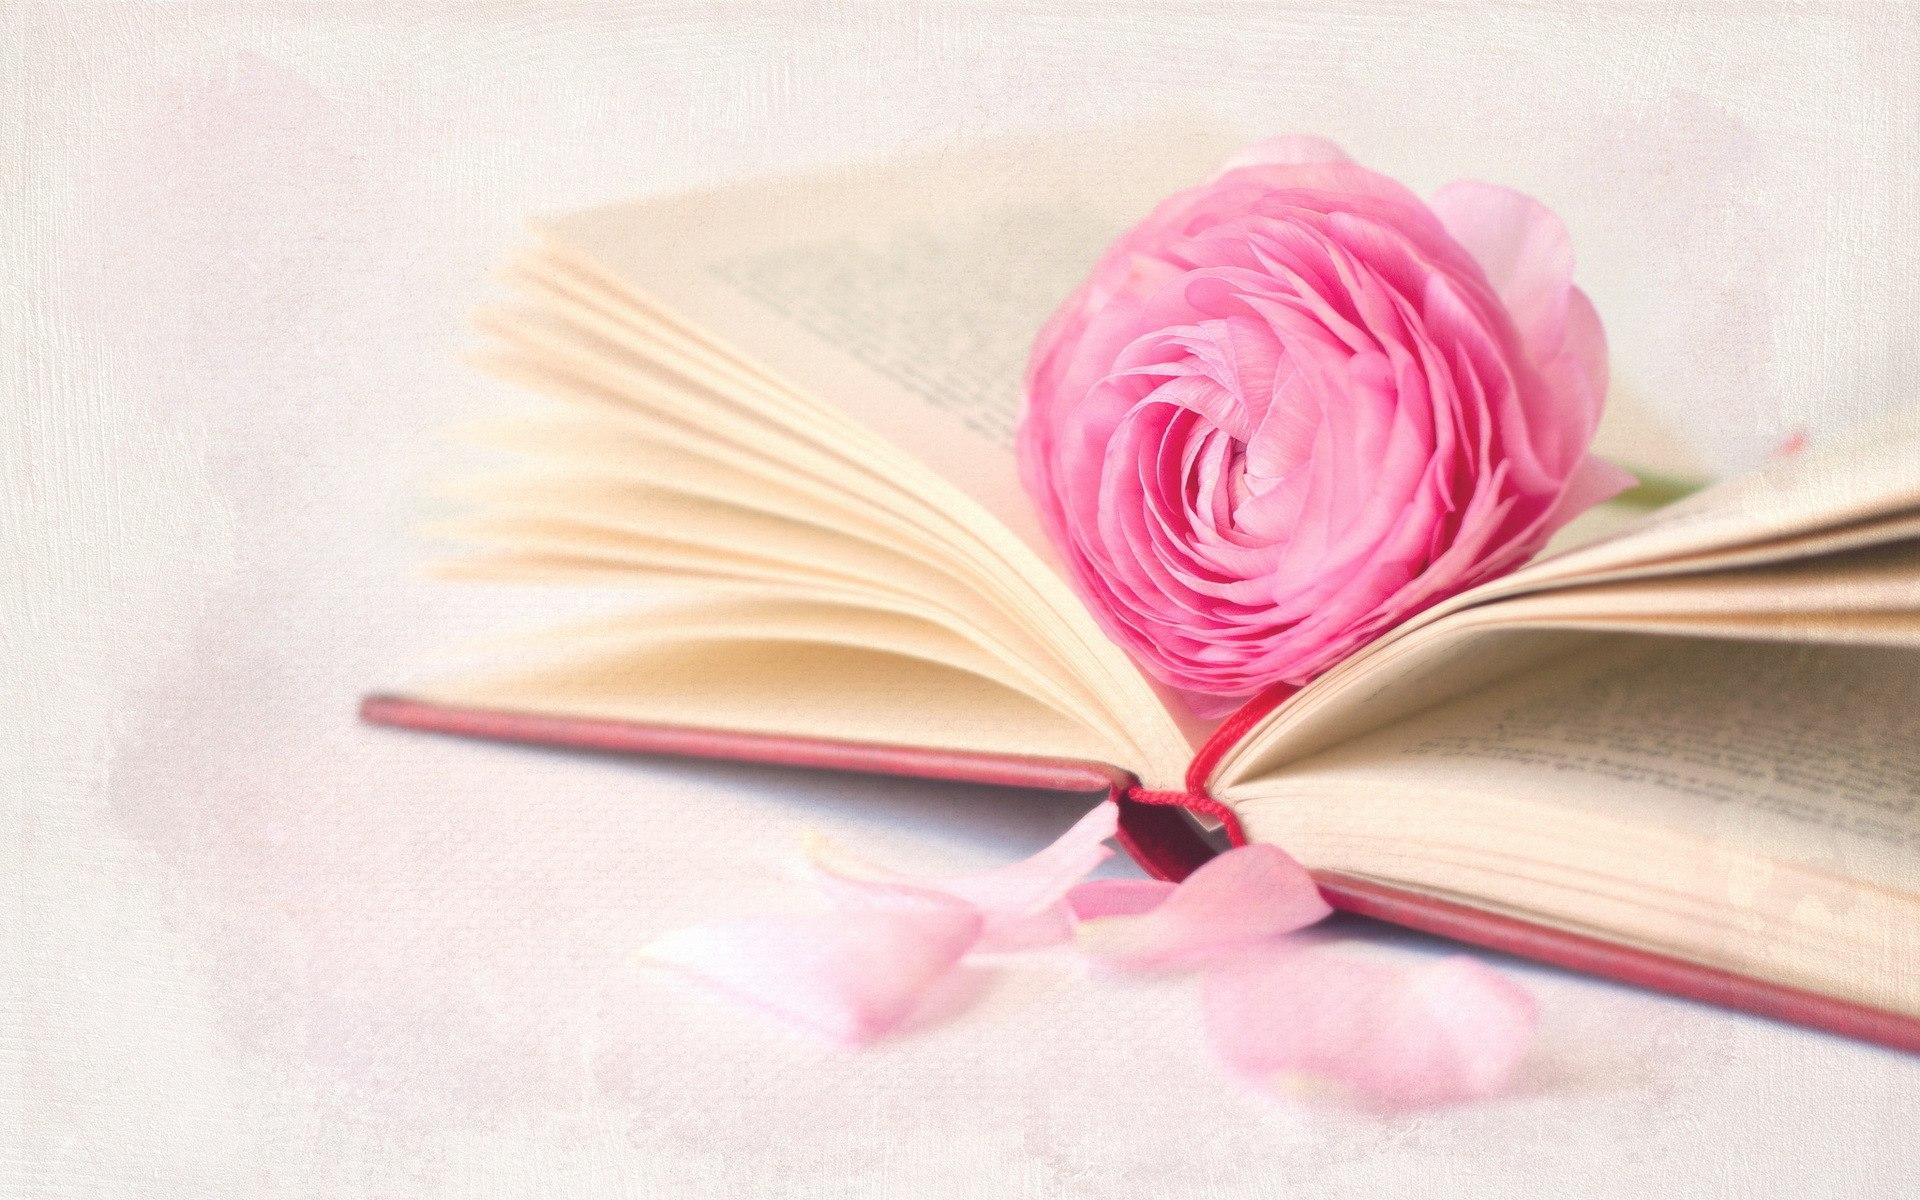 картинки для обложки книги цветы поймете